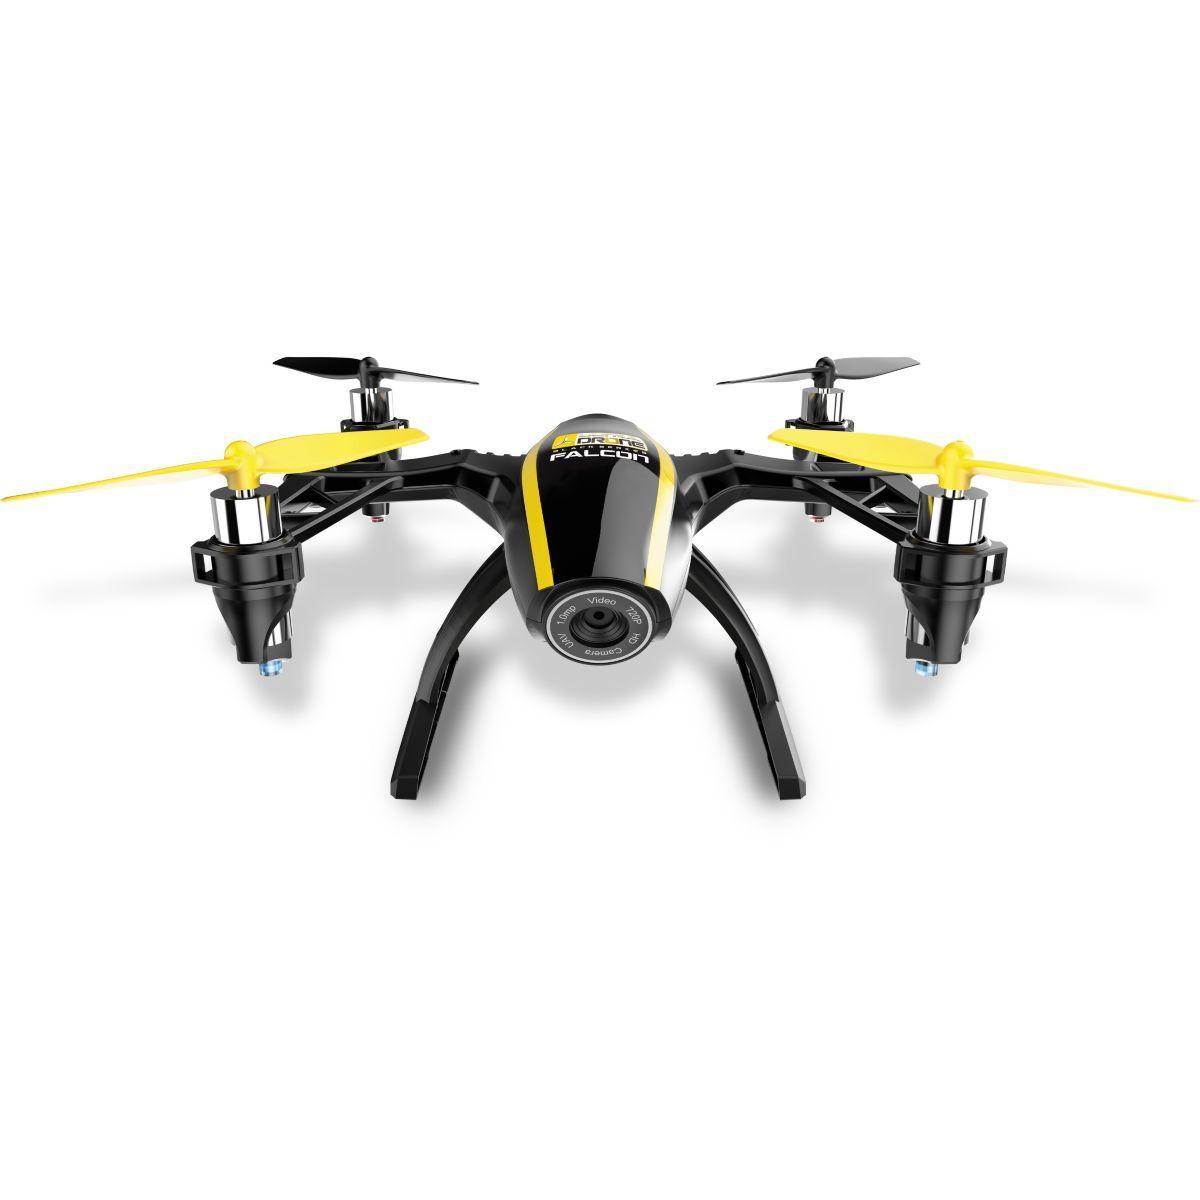 Drone mondo motors ultradrone falcon r/c - 7% de remise immédiate avec le code : fete7 (photo)